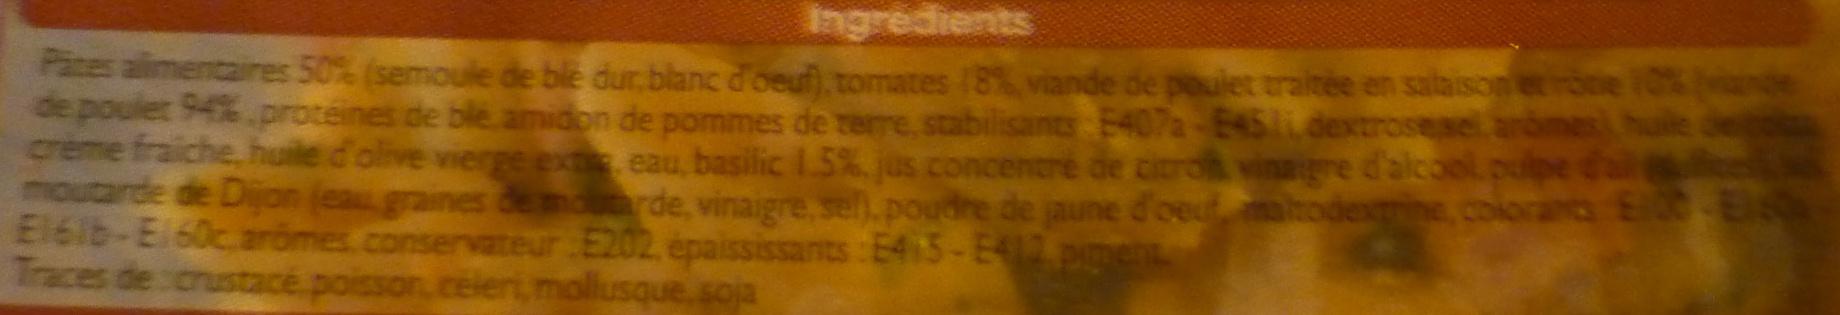 Penne au poulet - Ingrediënten